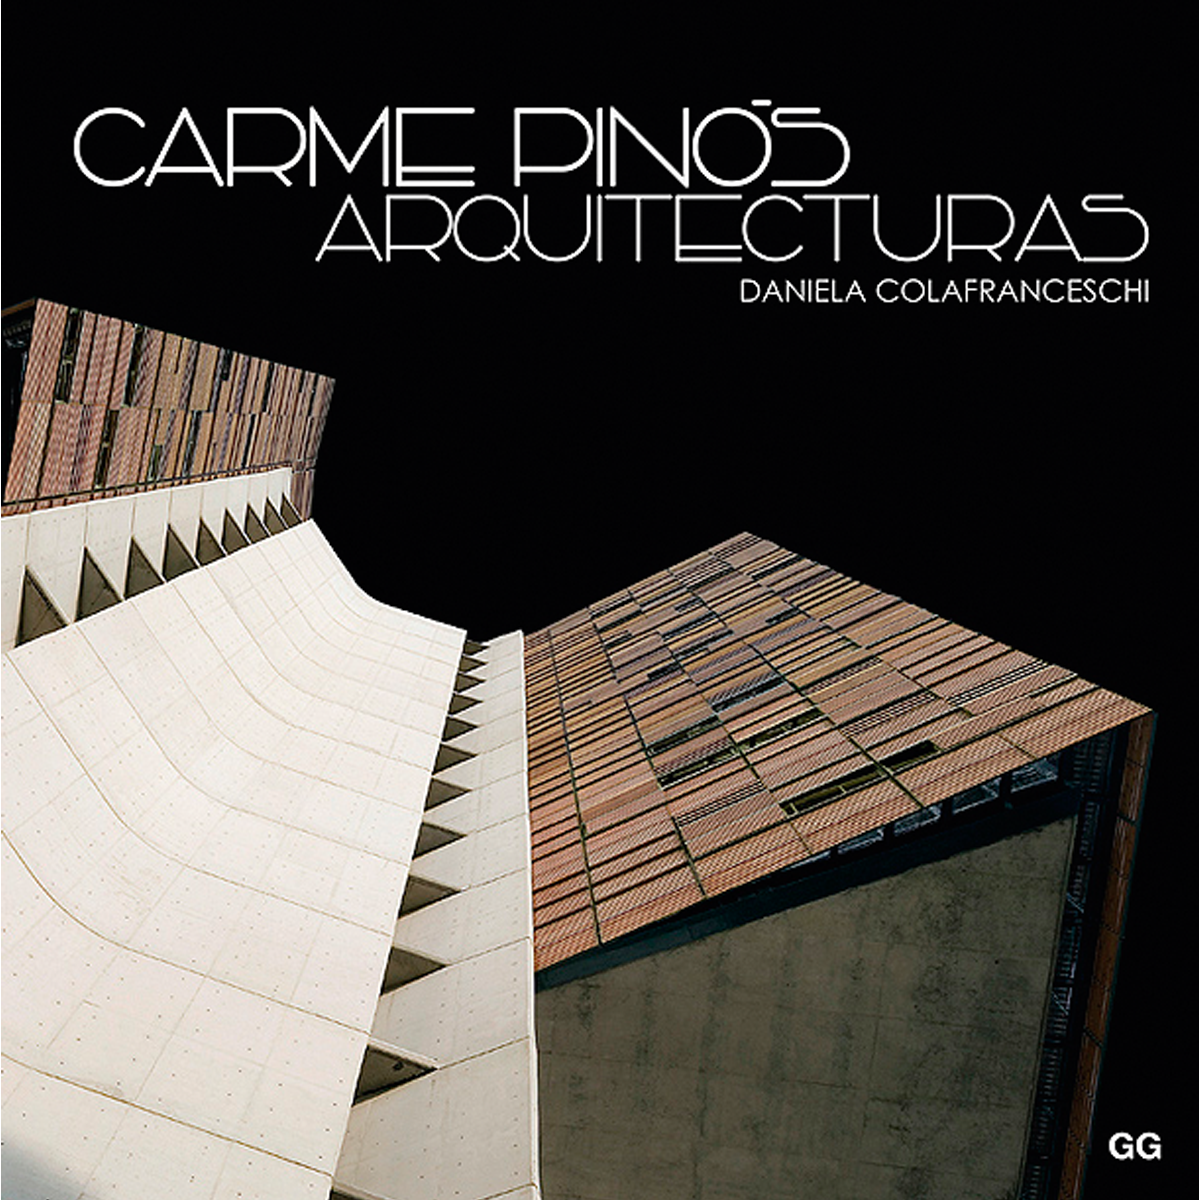 Carme Pinós Arquitecturas